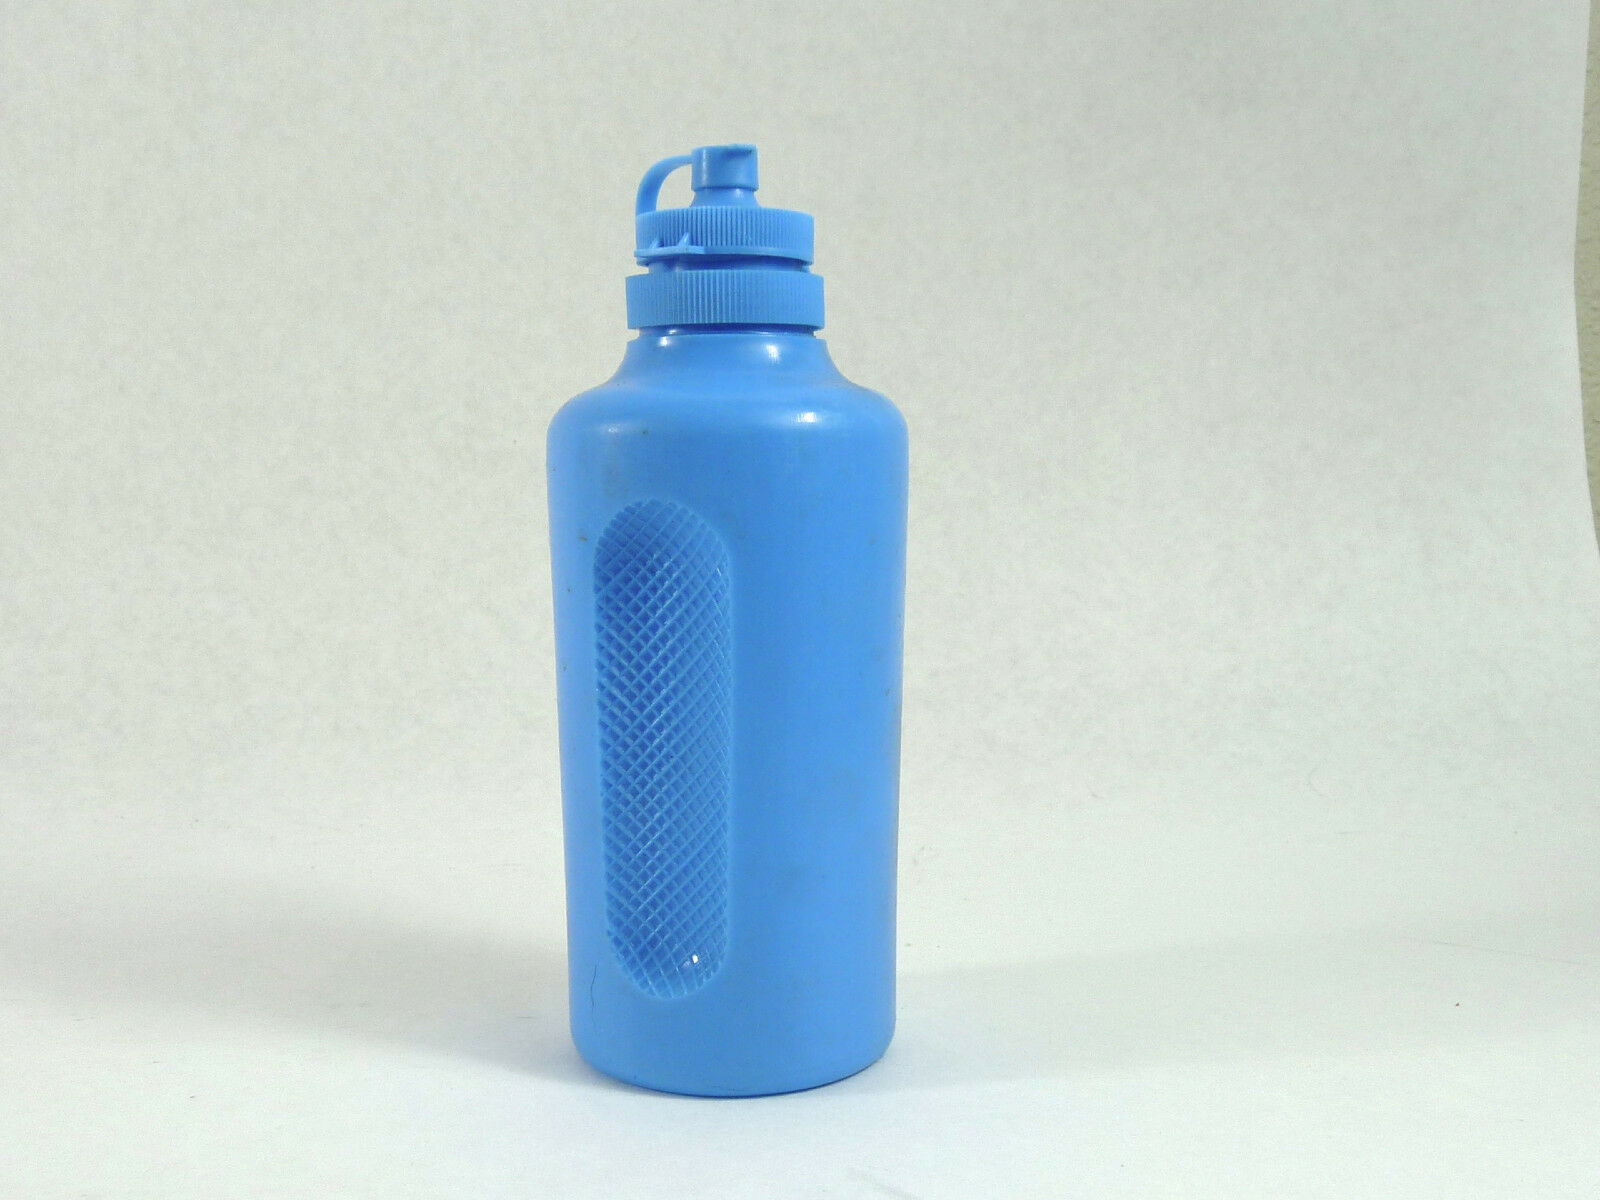 Mariplast Water Bottle Italian Made Light bluee Very Rare Vintage  Road Bike NOS  first-class service